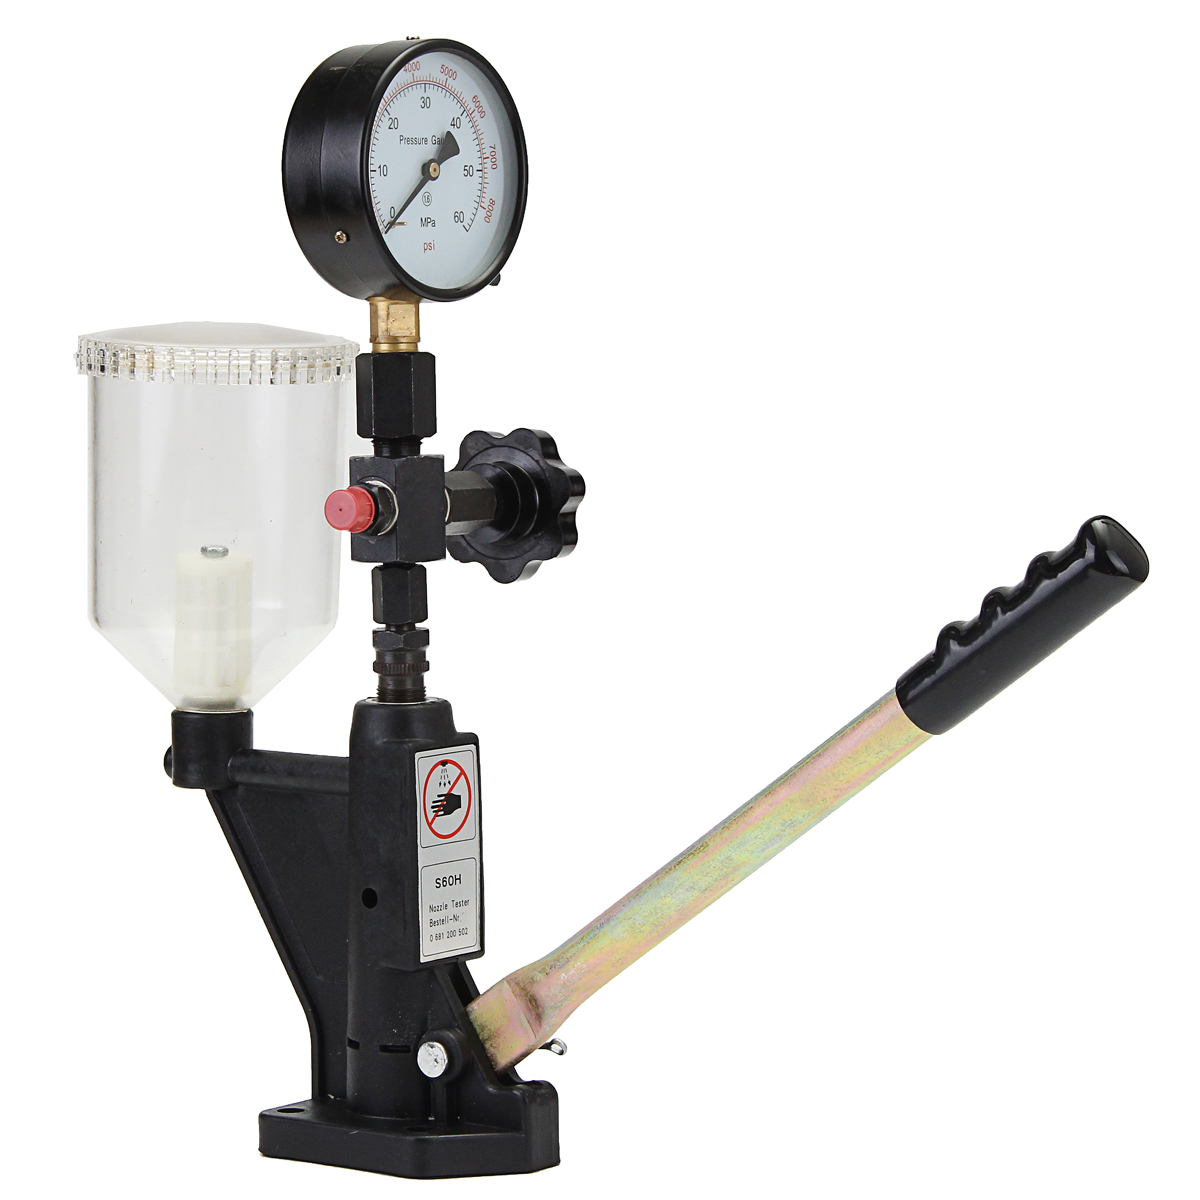 Max 60 Mpa Nozzle Pop Pressure Tester 0-400 BAR Common Rail Tool Fuel  Injector Calibrator Dual Scale Gauge Diagnostic Metal